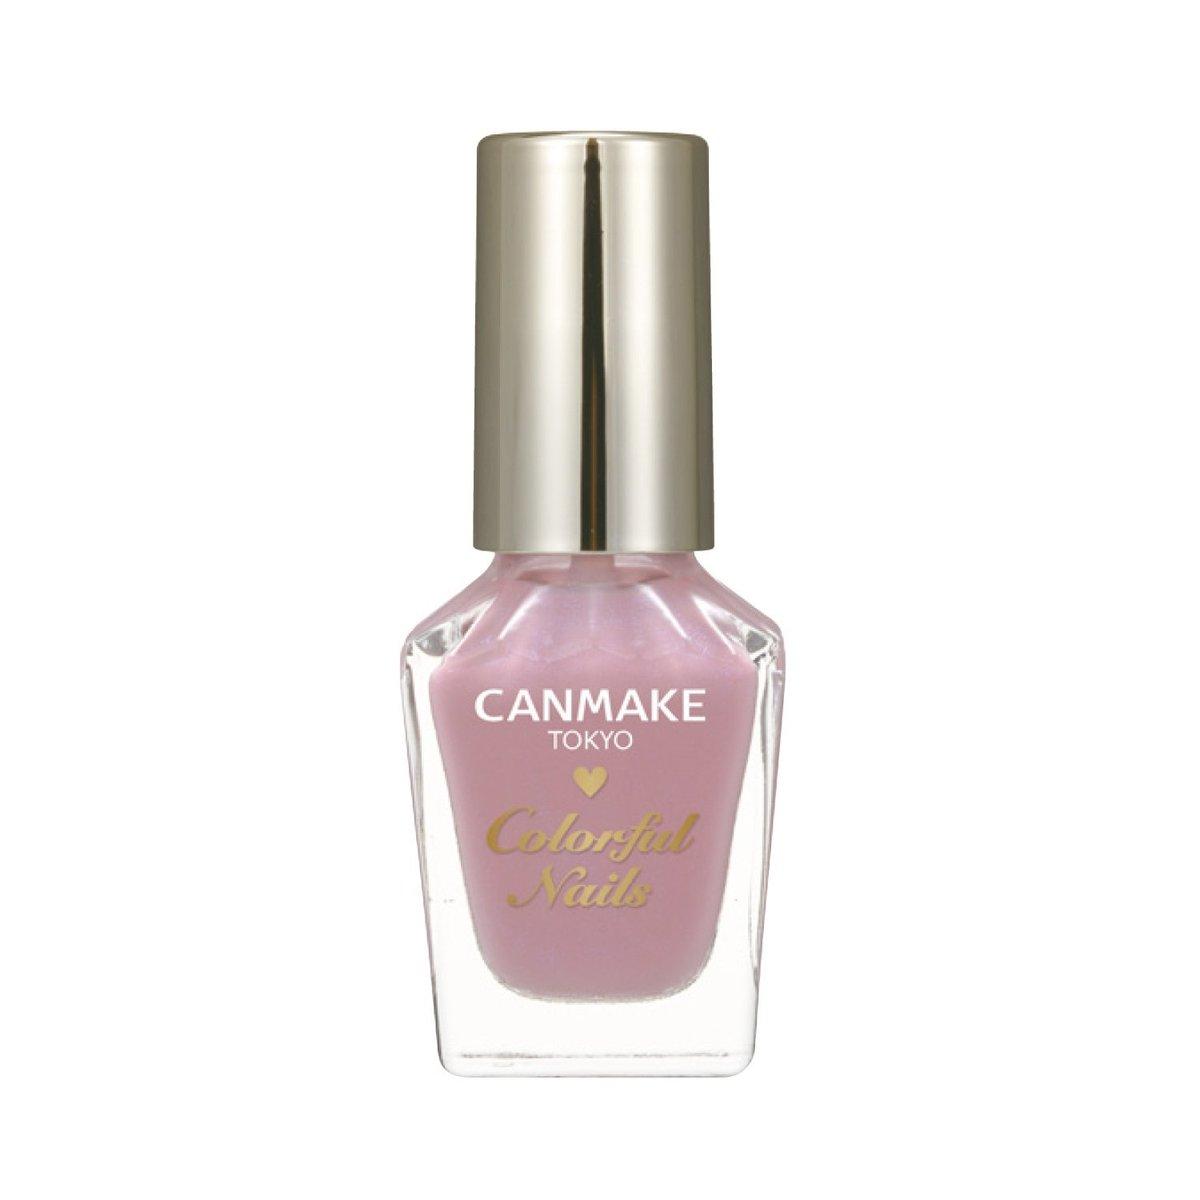 Colorful Nails - N10 Pale Lavender